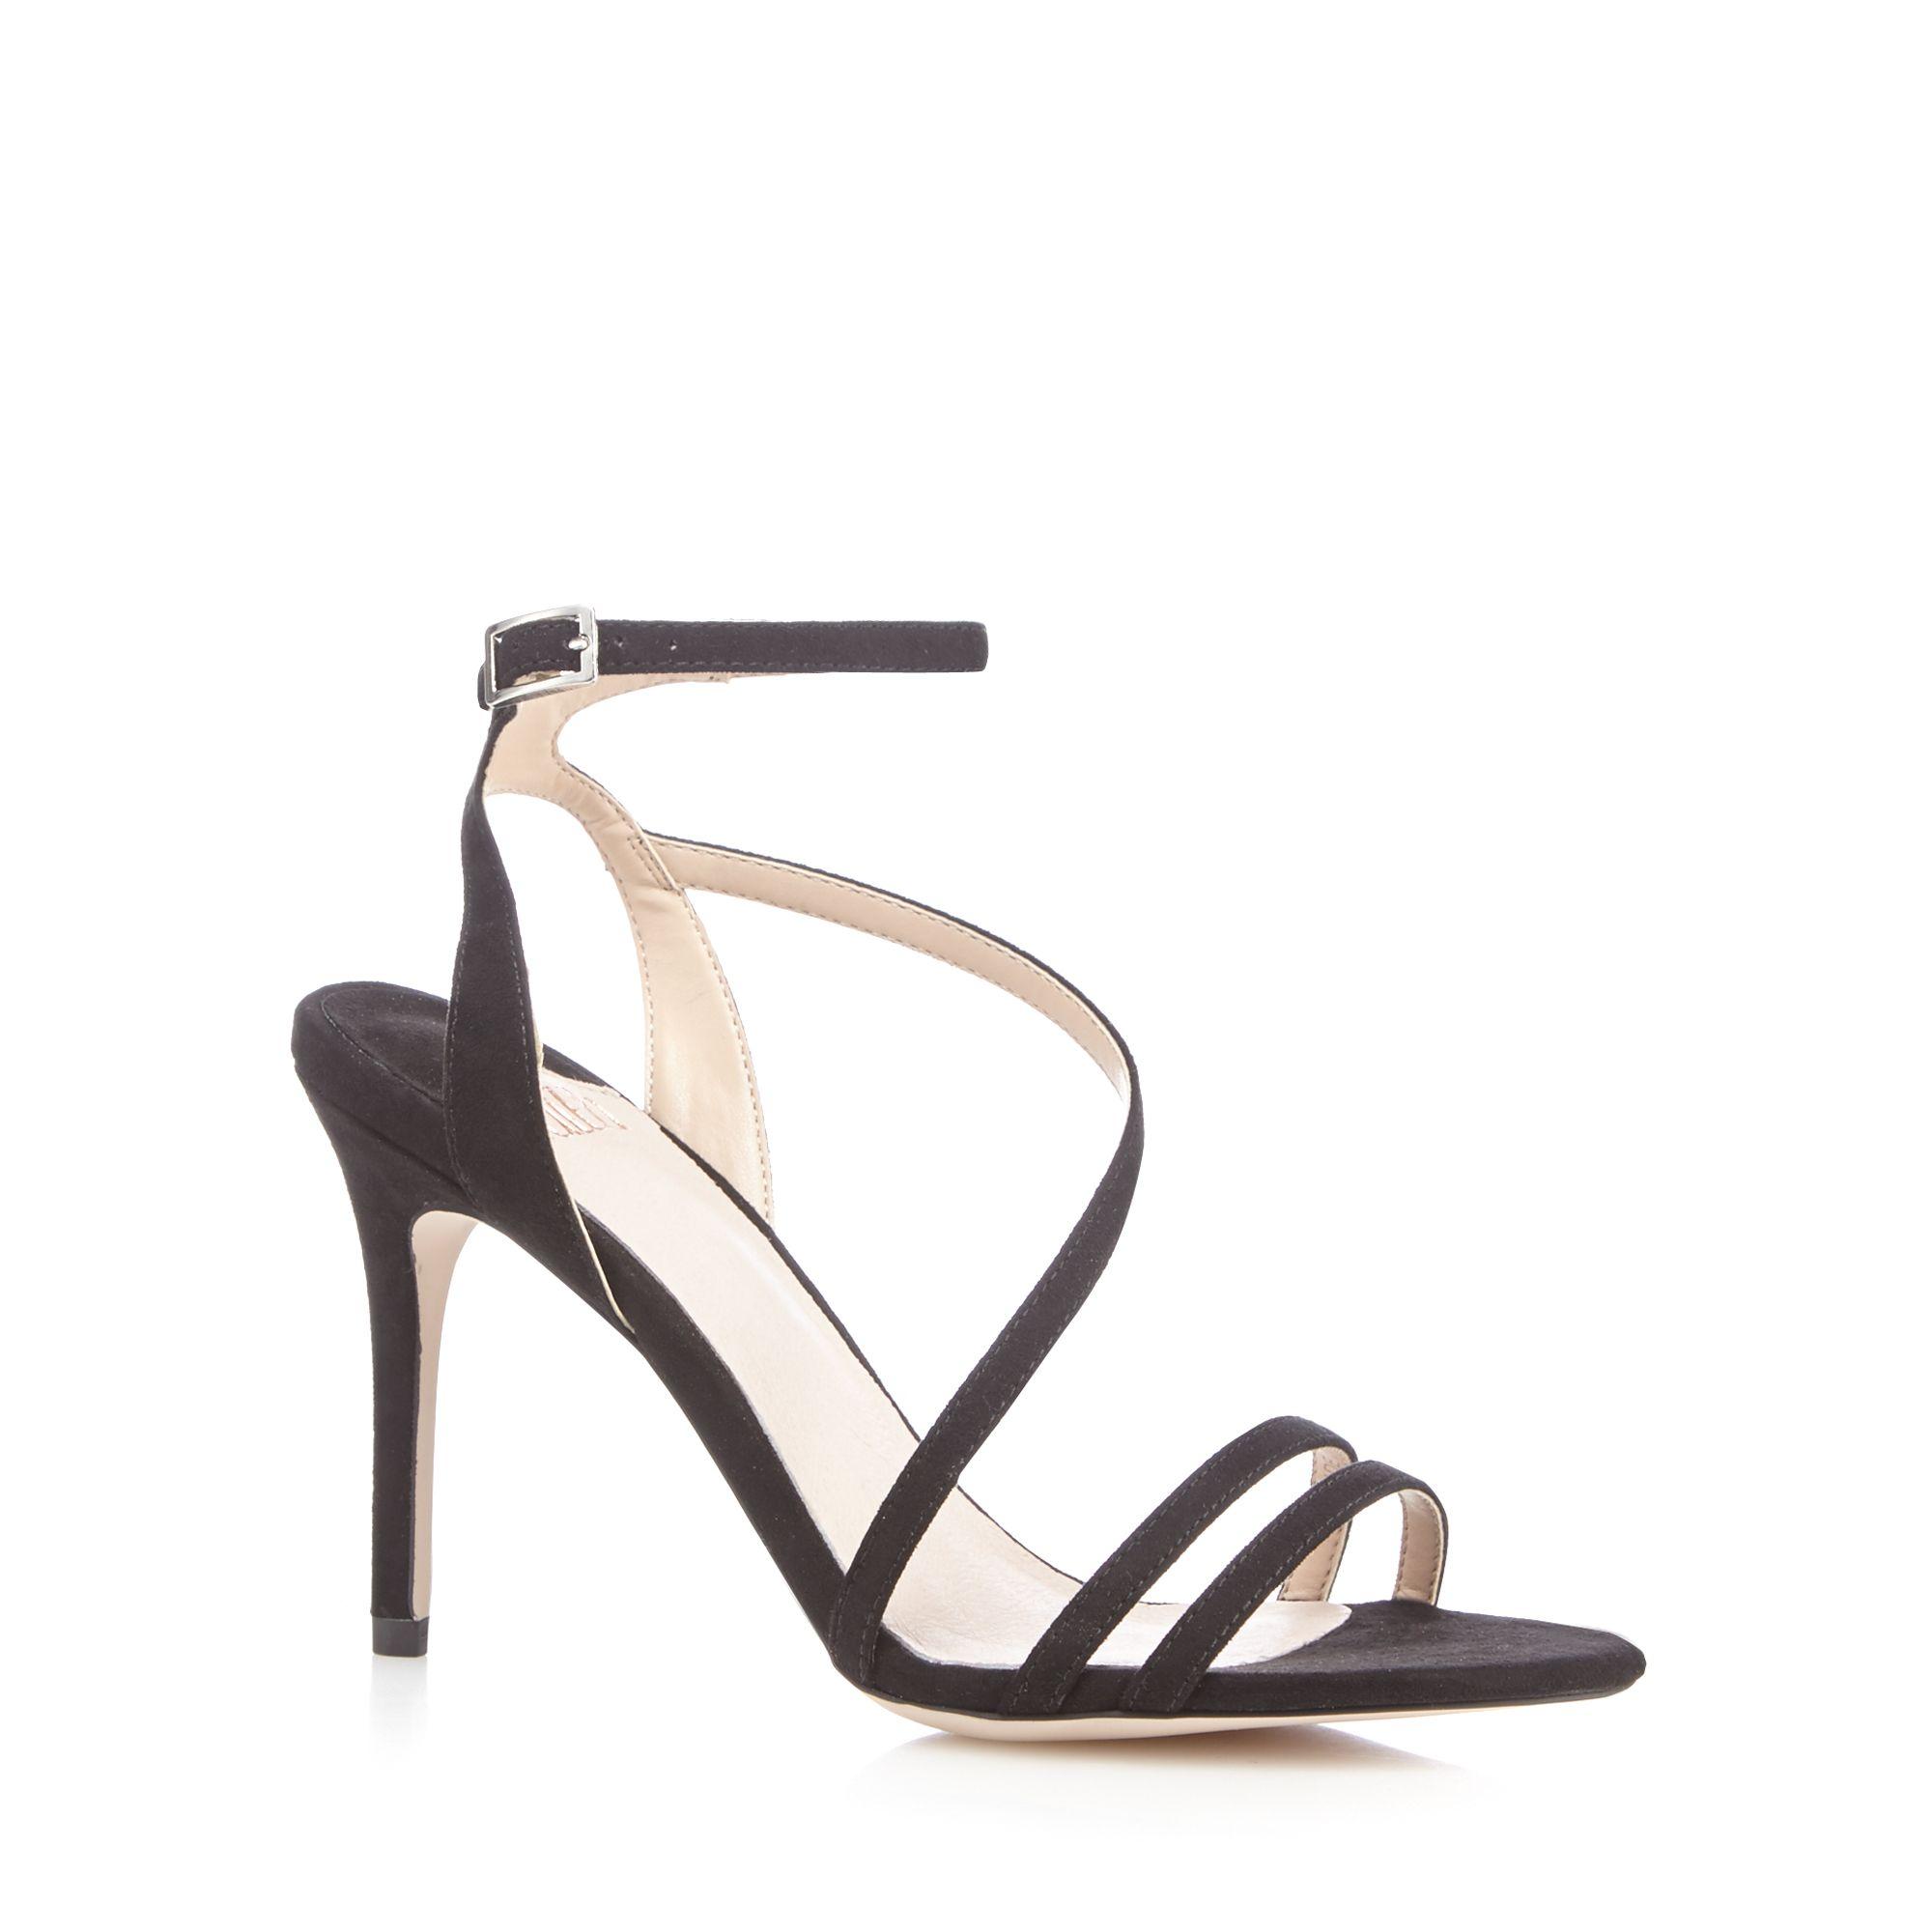 Black sandals debenhams - Image Is Loading Faith Black 039 Lucas 039 High Stiletto Heel